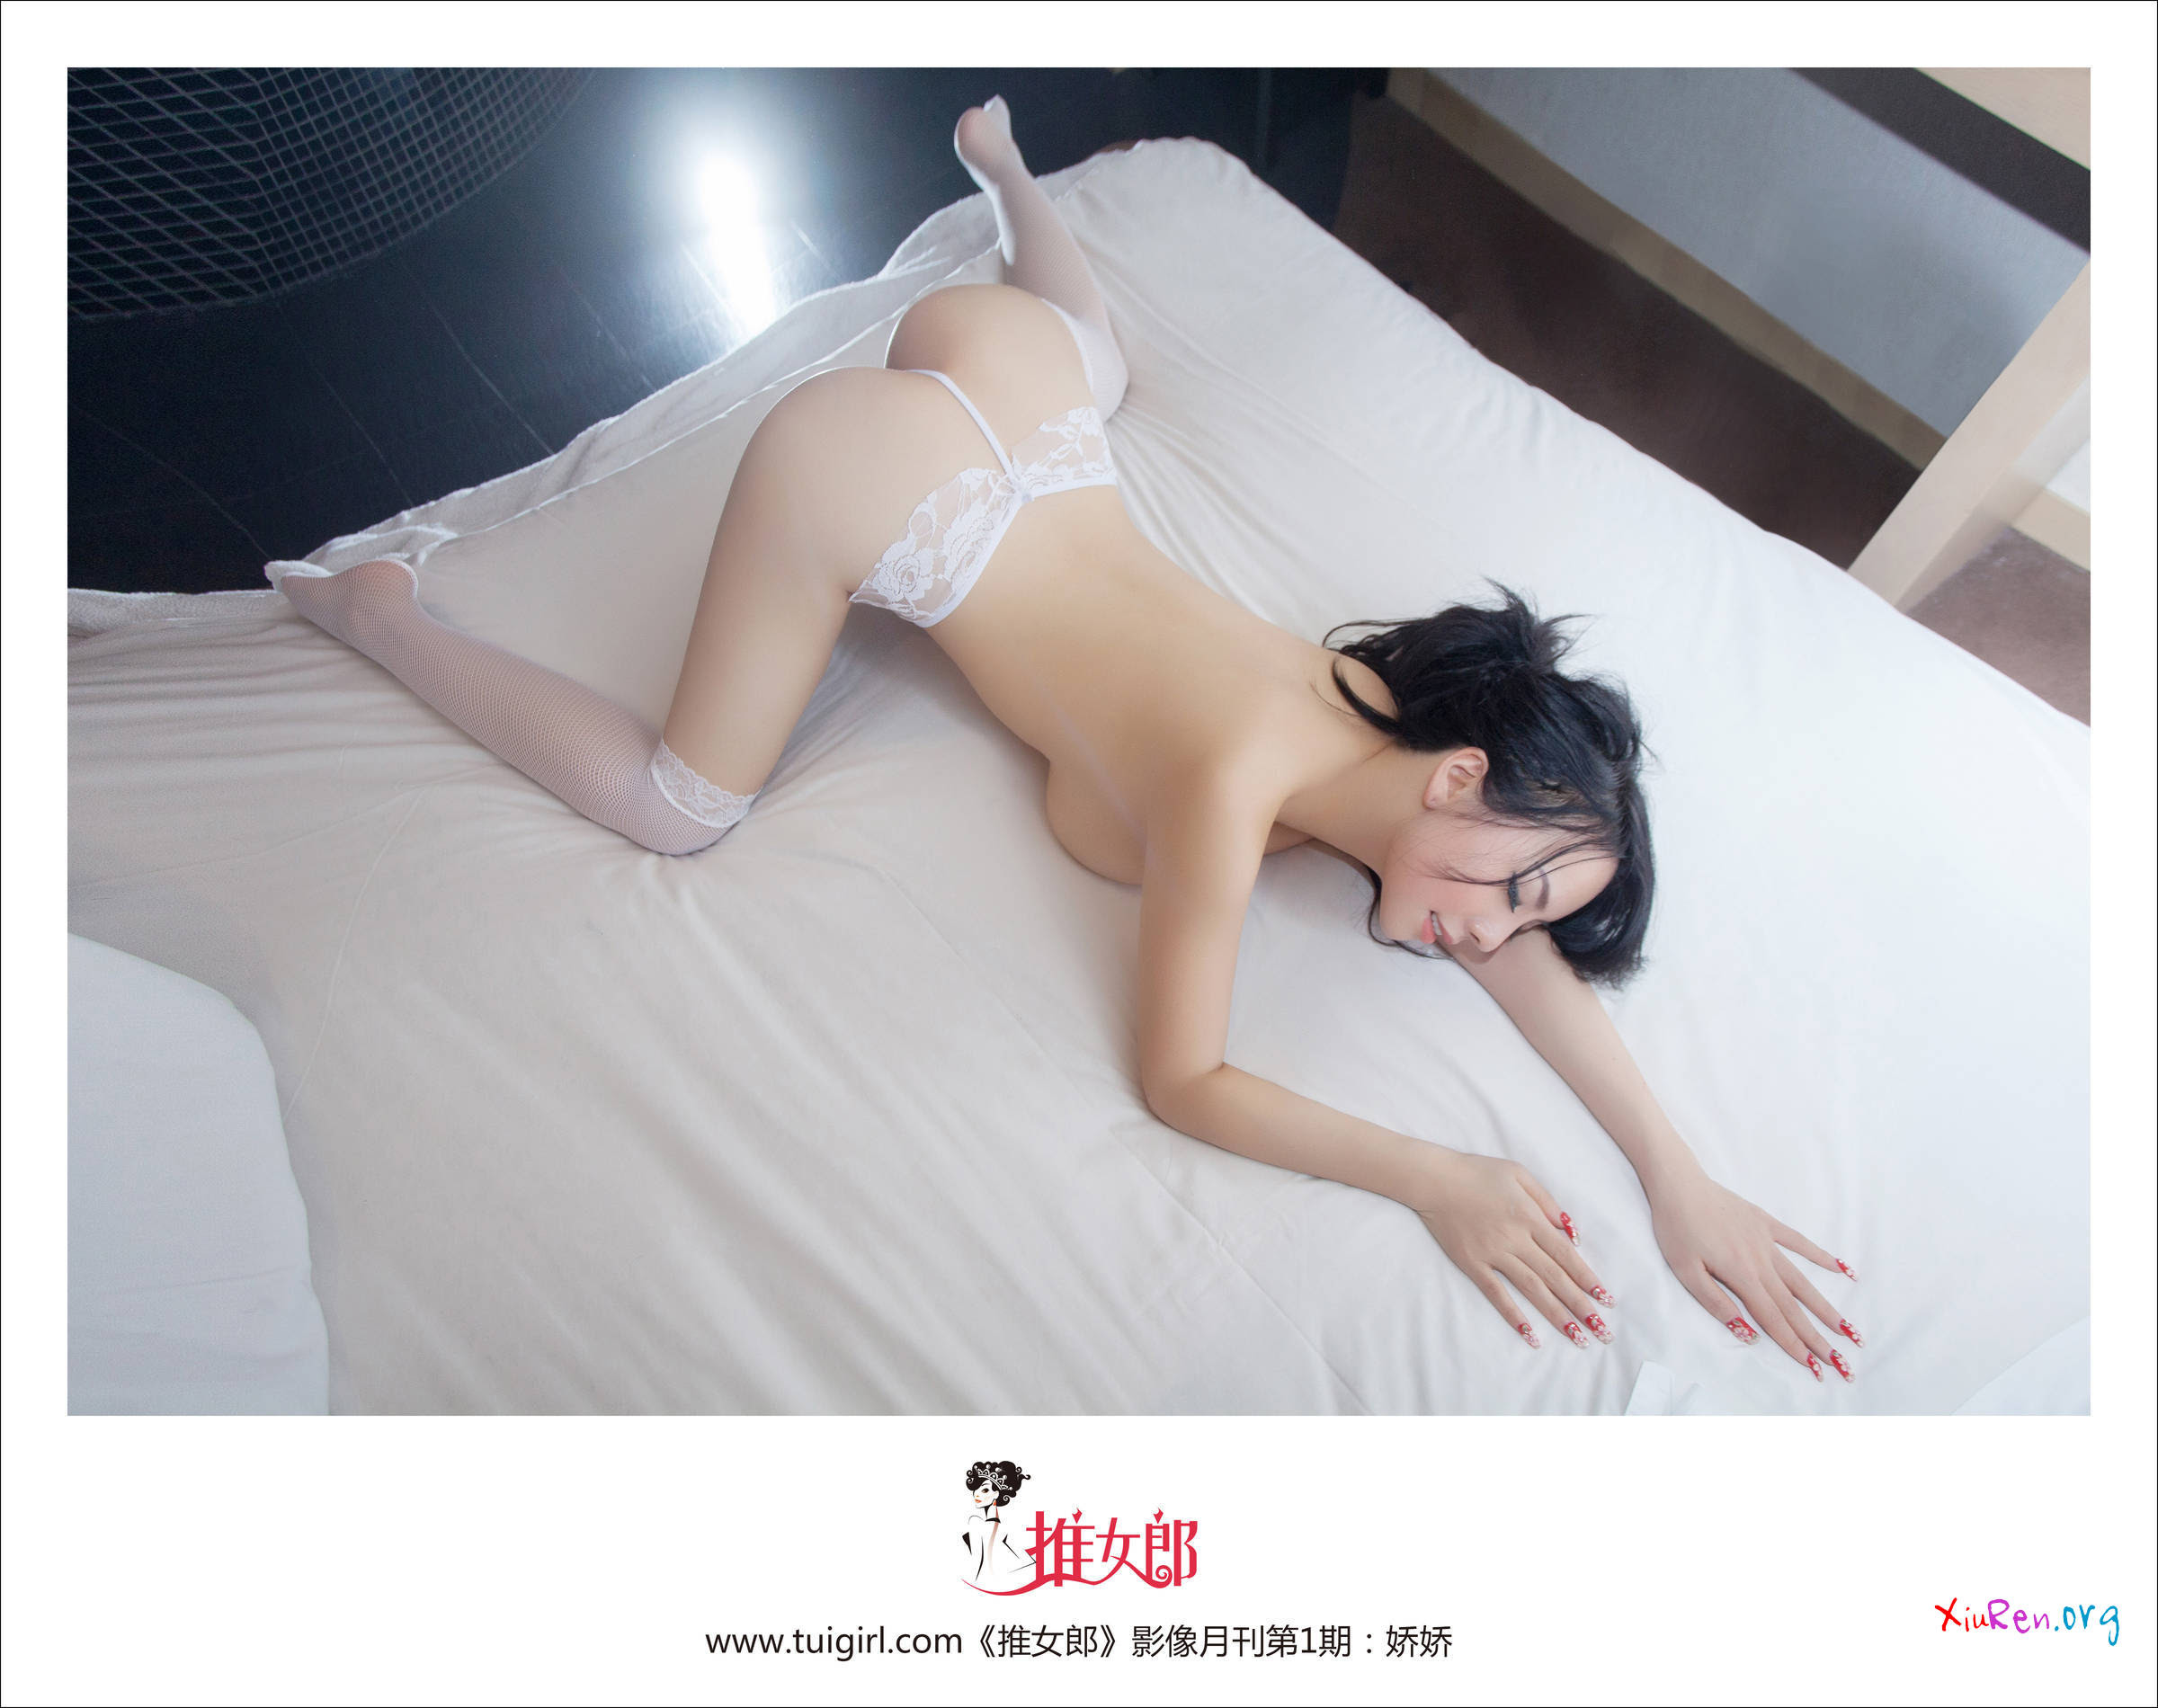 tuigirl-001-jiaojiao-05.jpg